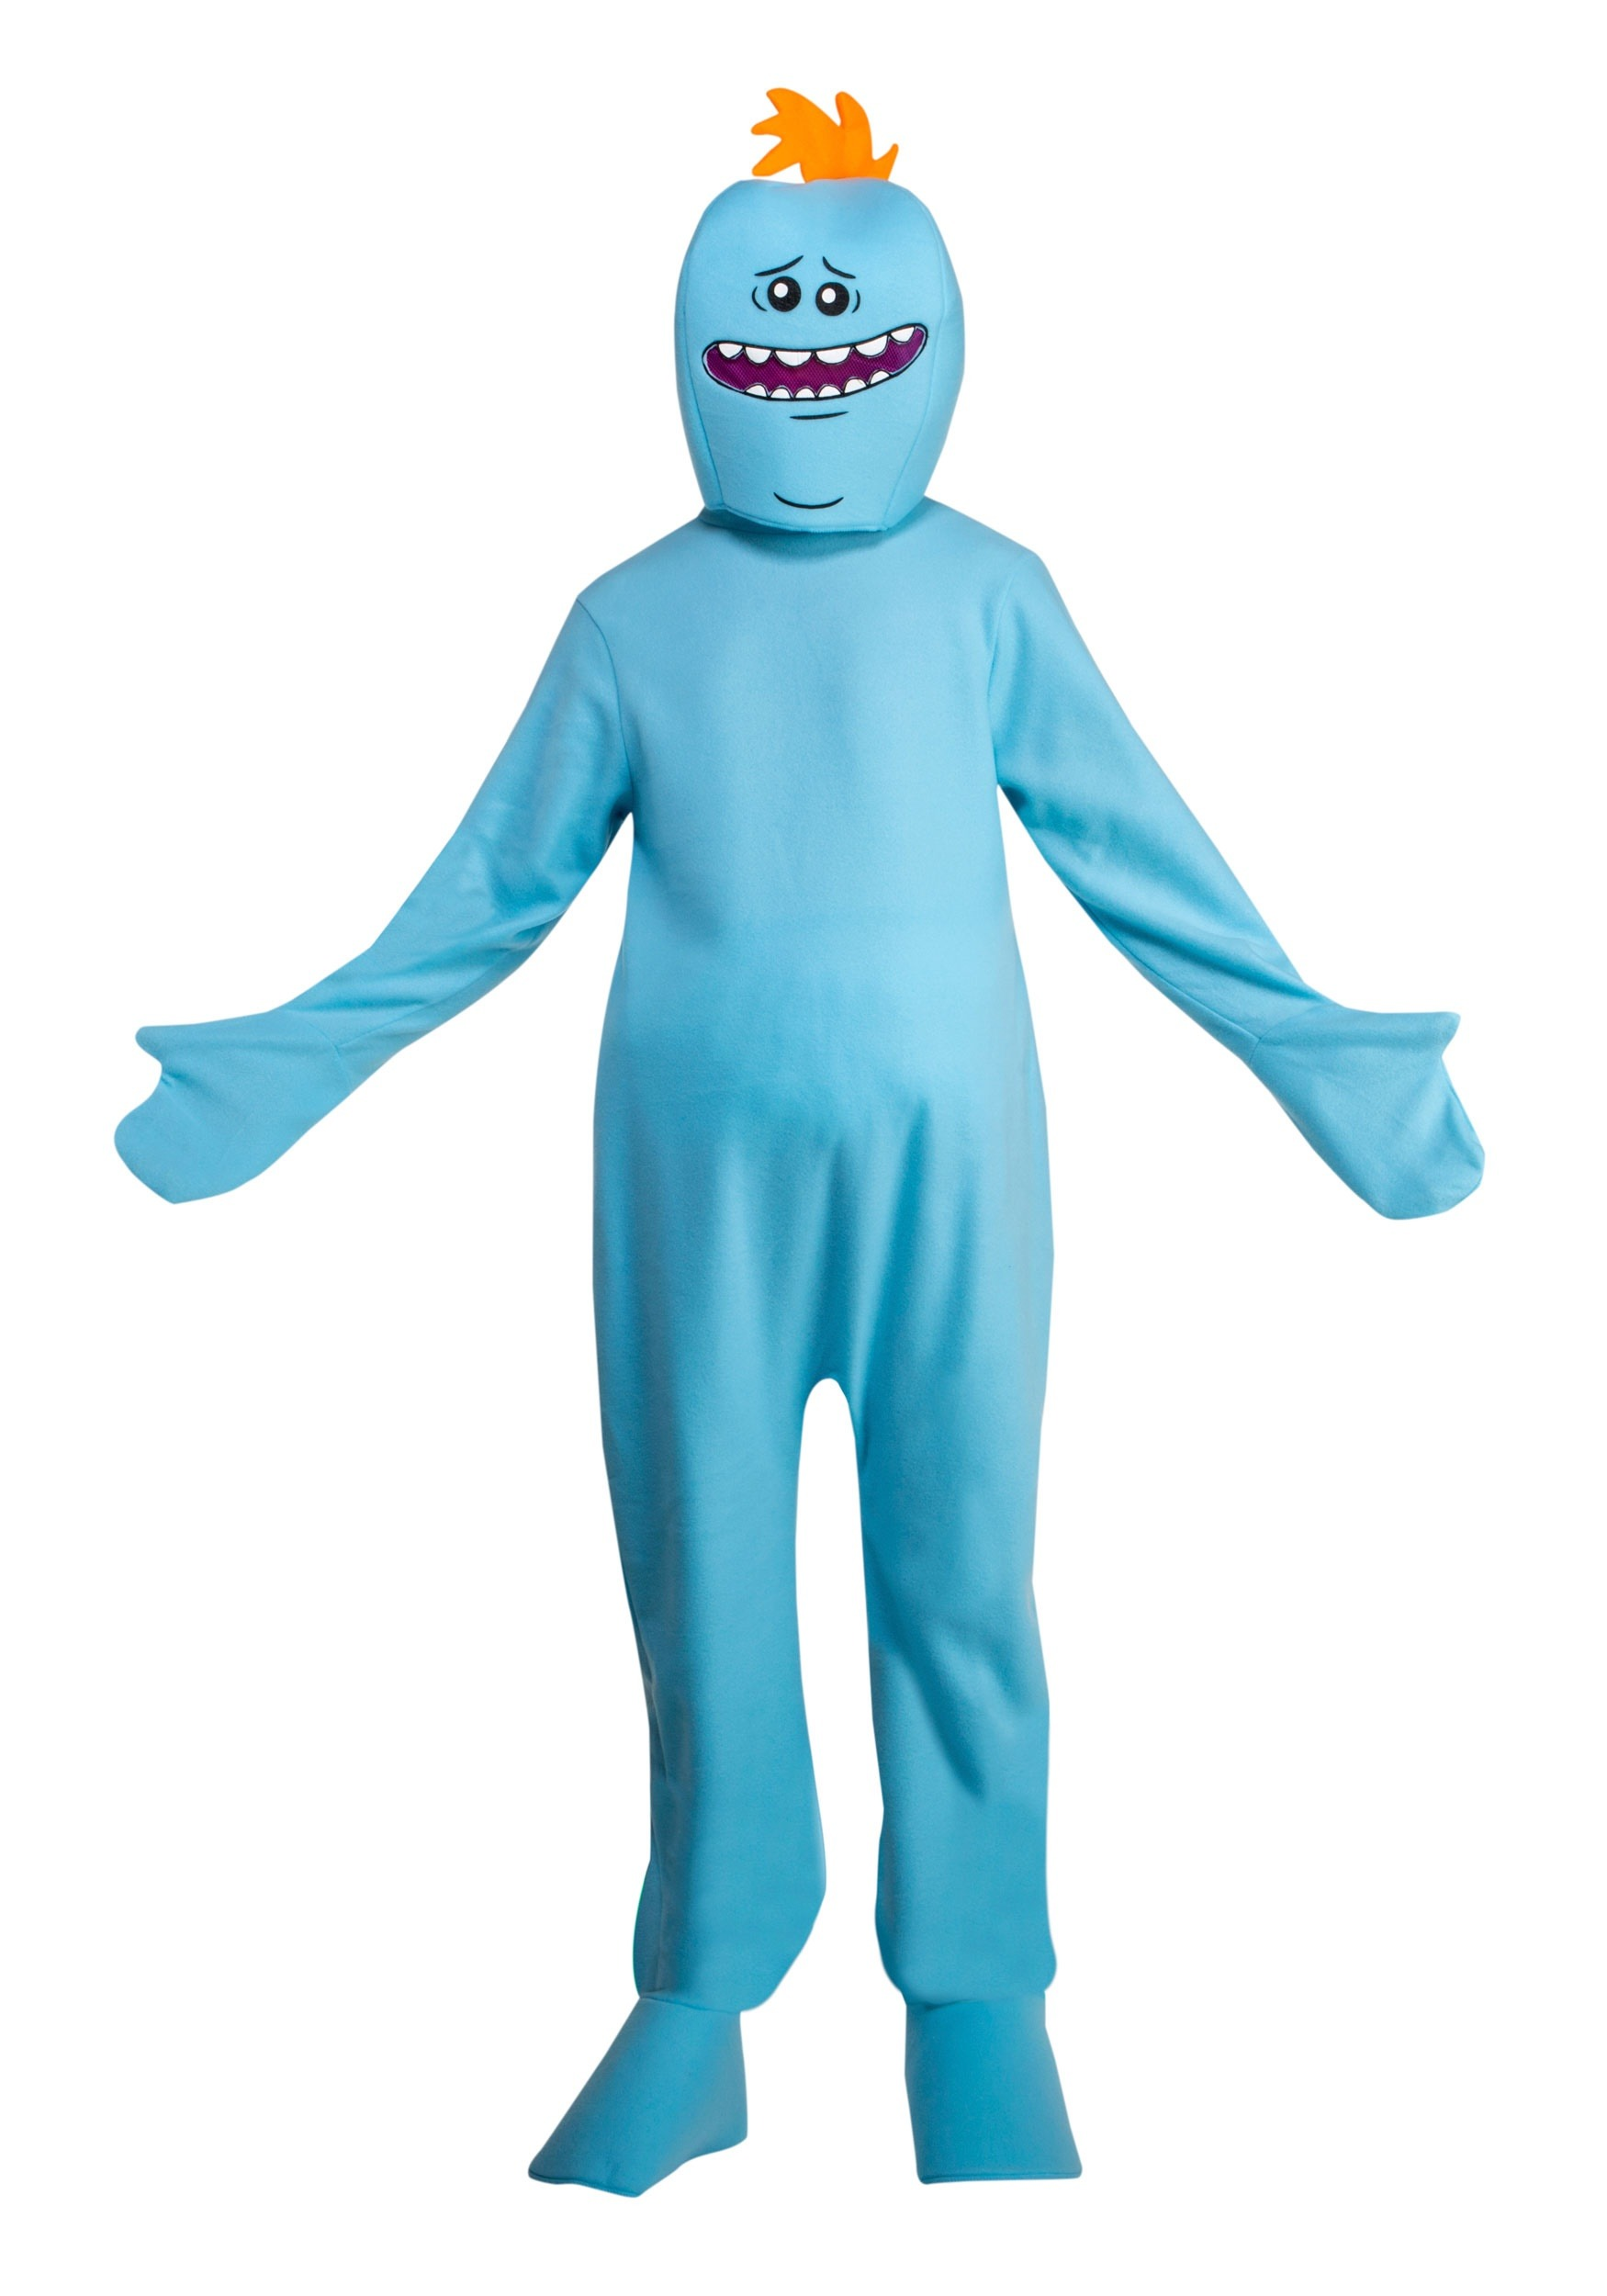 Mr. Meeseeks Rick and Morty Adult Costume 3e7f2f296